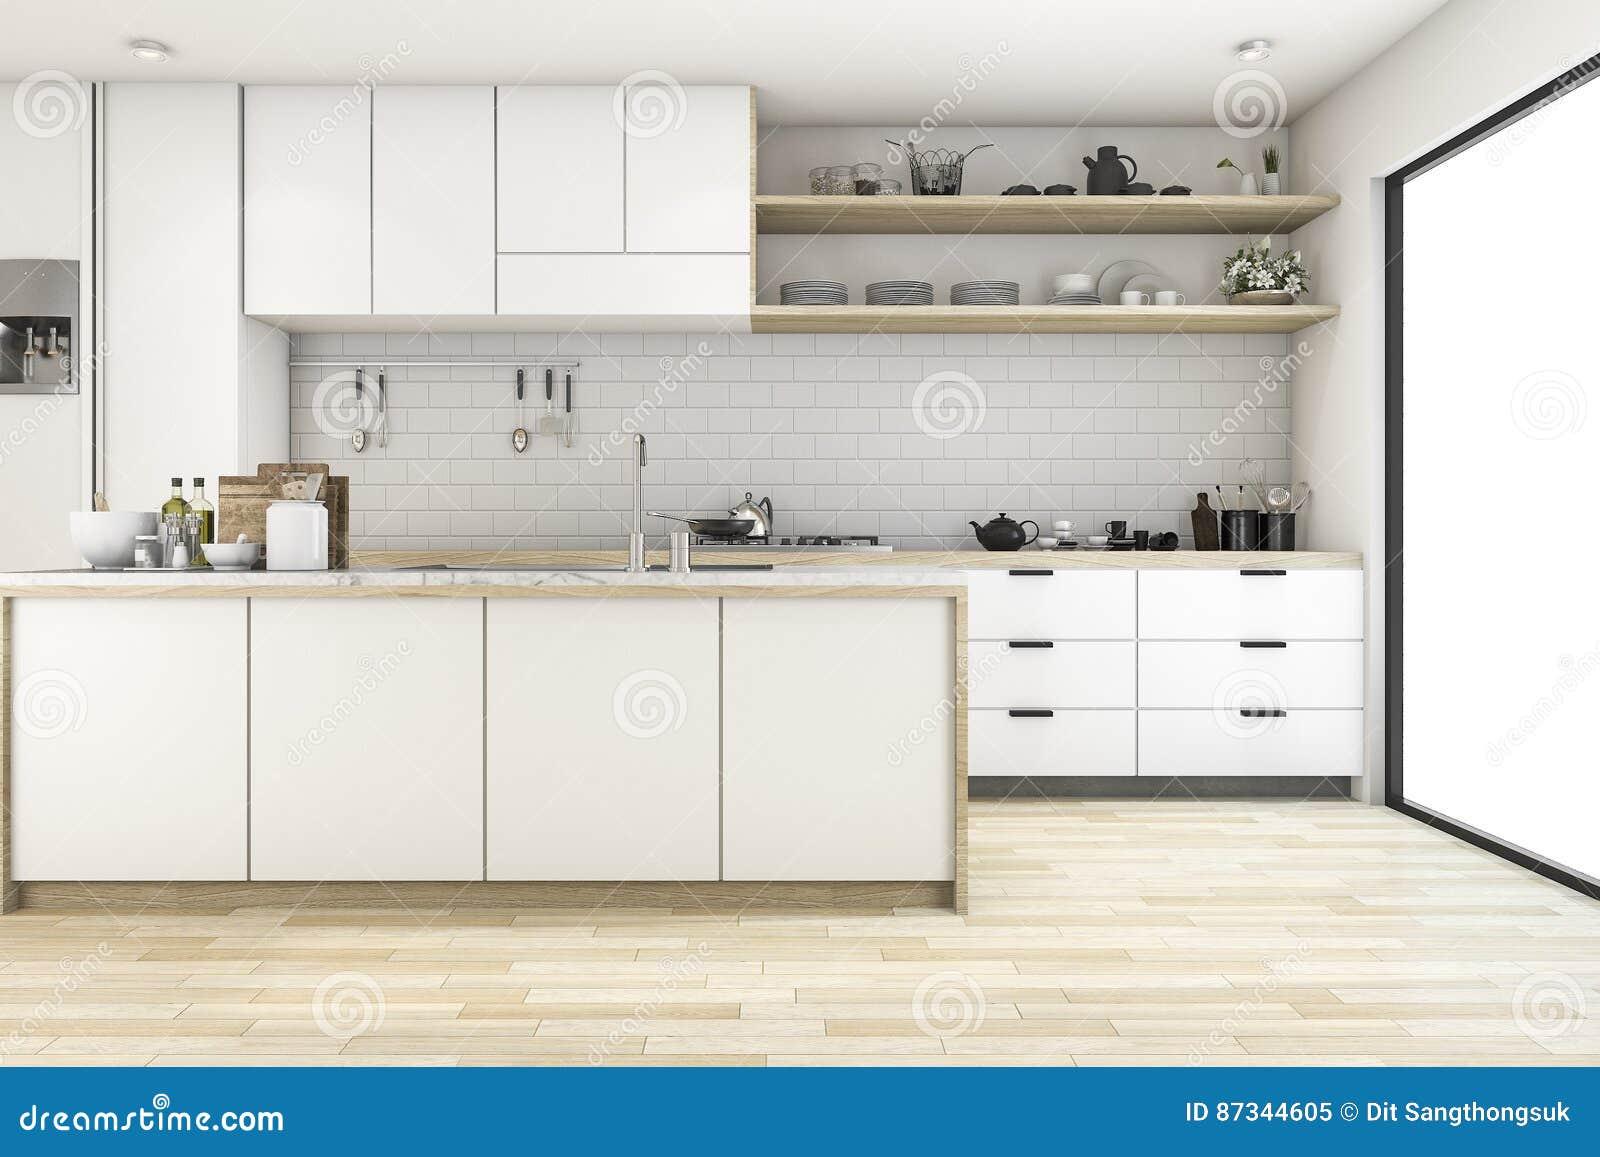 Disegnare Cucina 3d Gratis. Great Gallery Of Disegna La ...